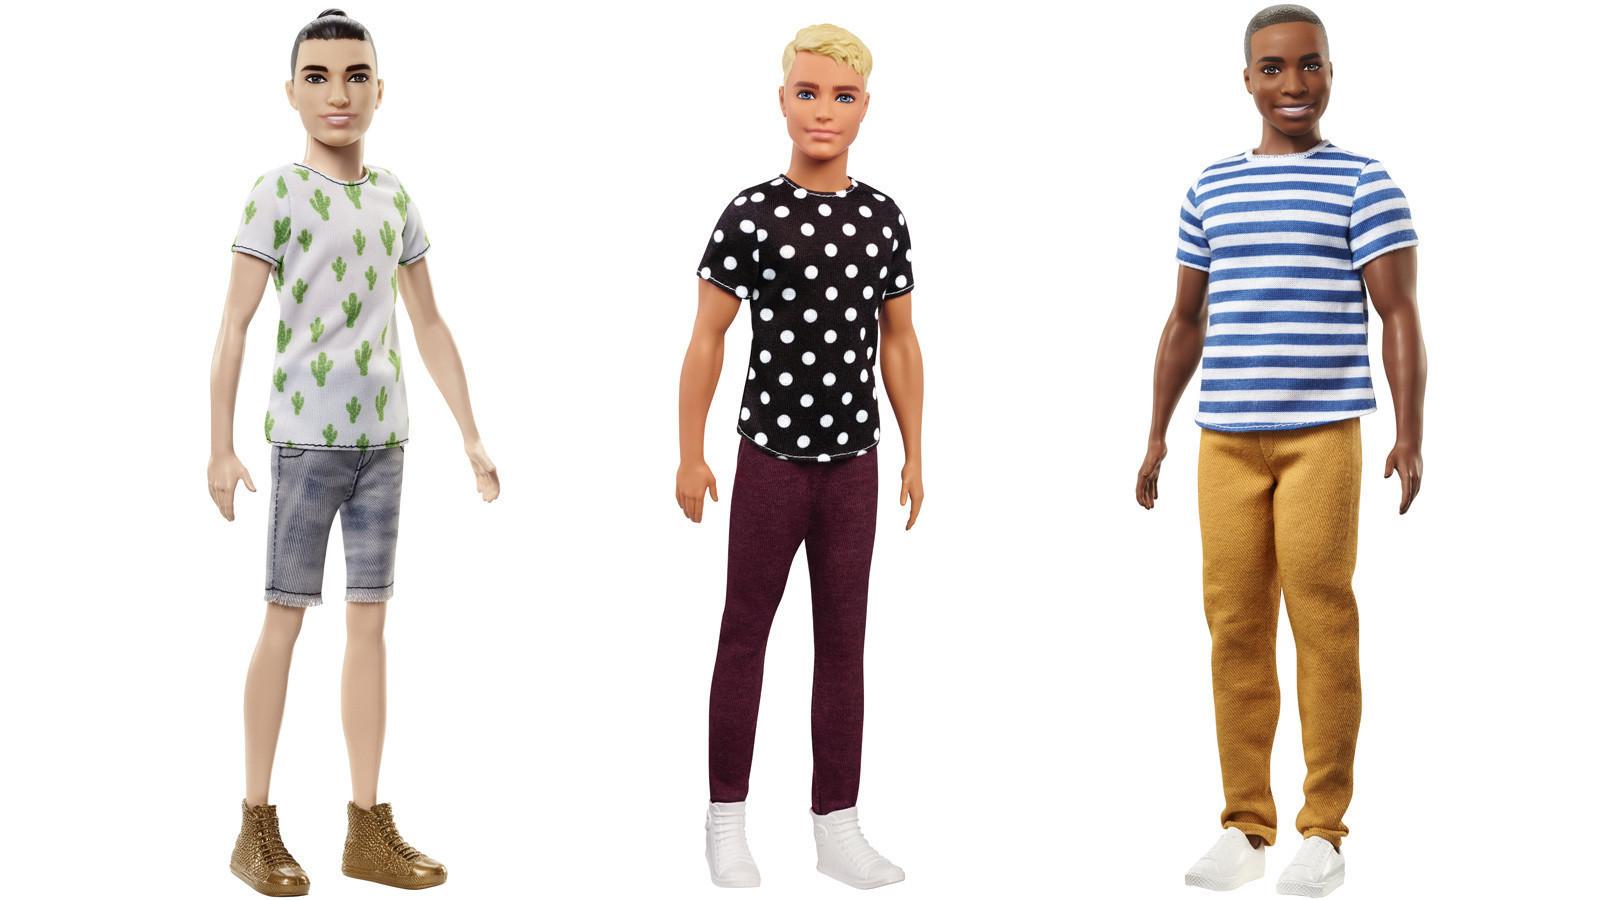 abcnews.go.com Barbie, are you ready for man-bun or dad-bod Ken?